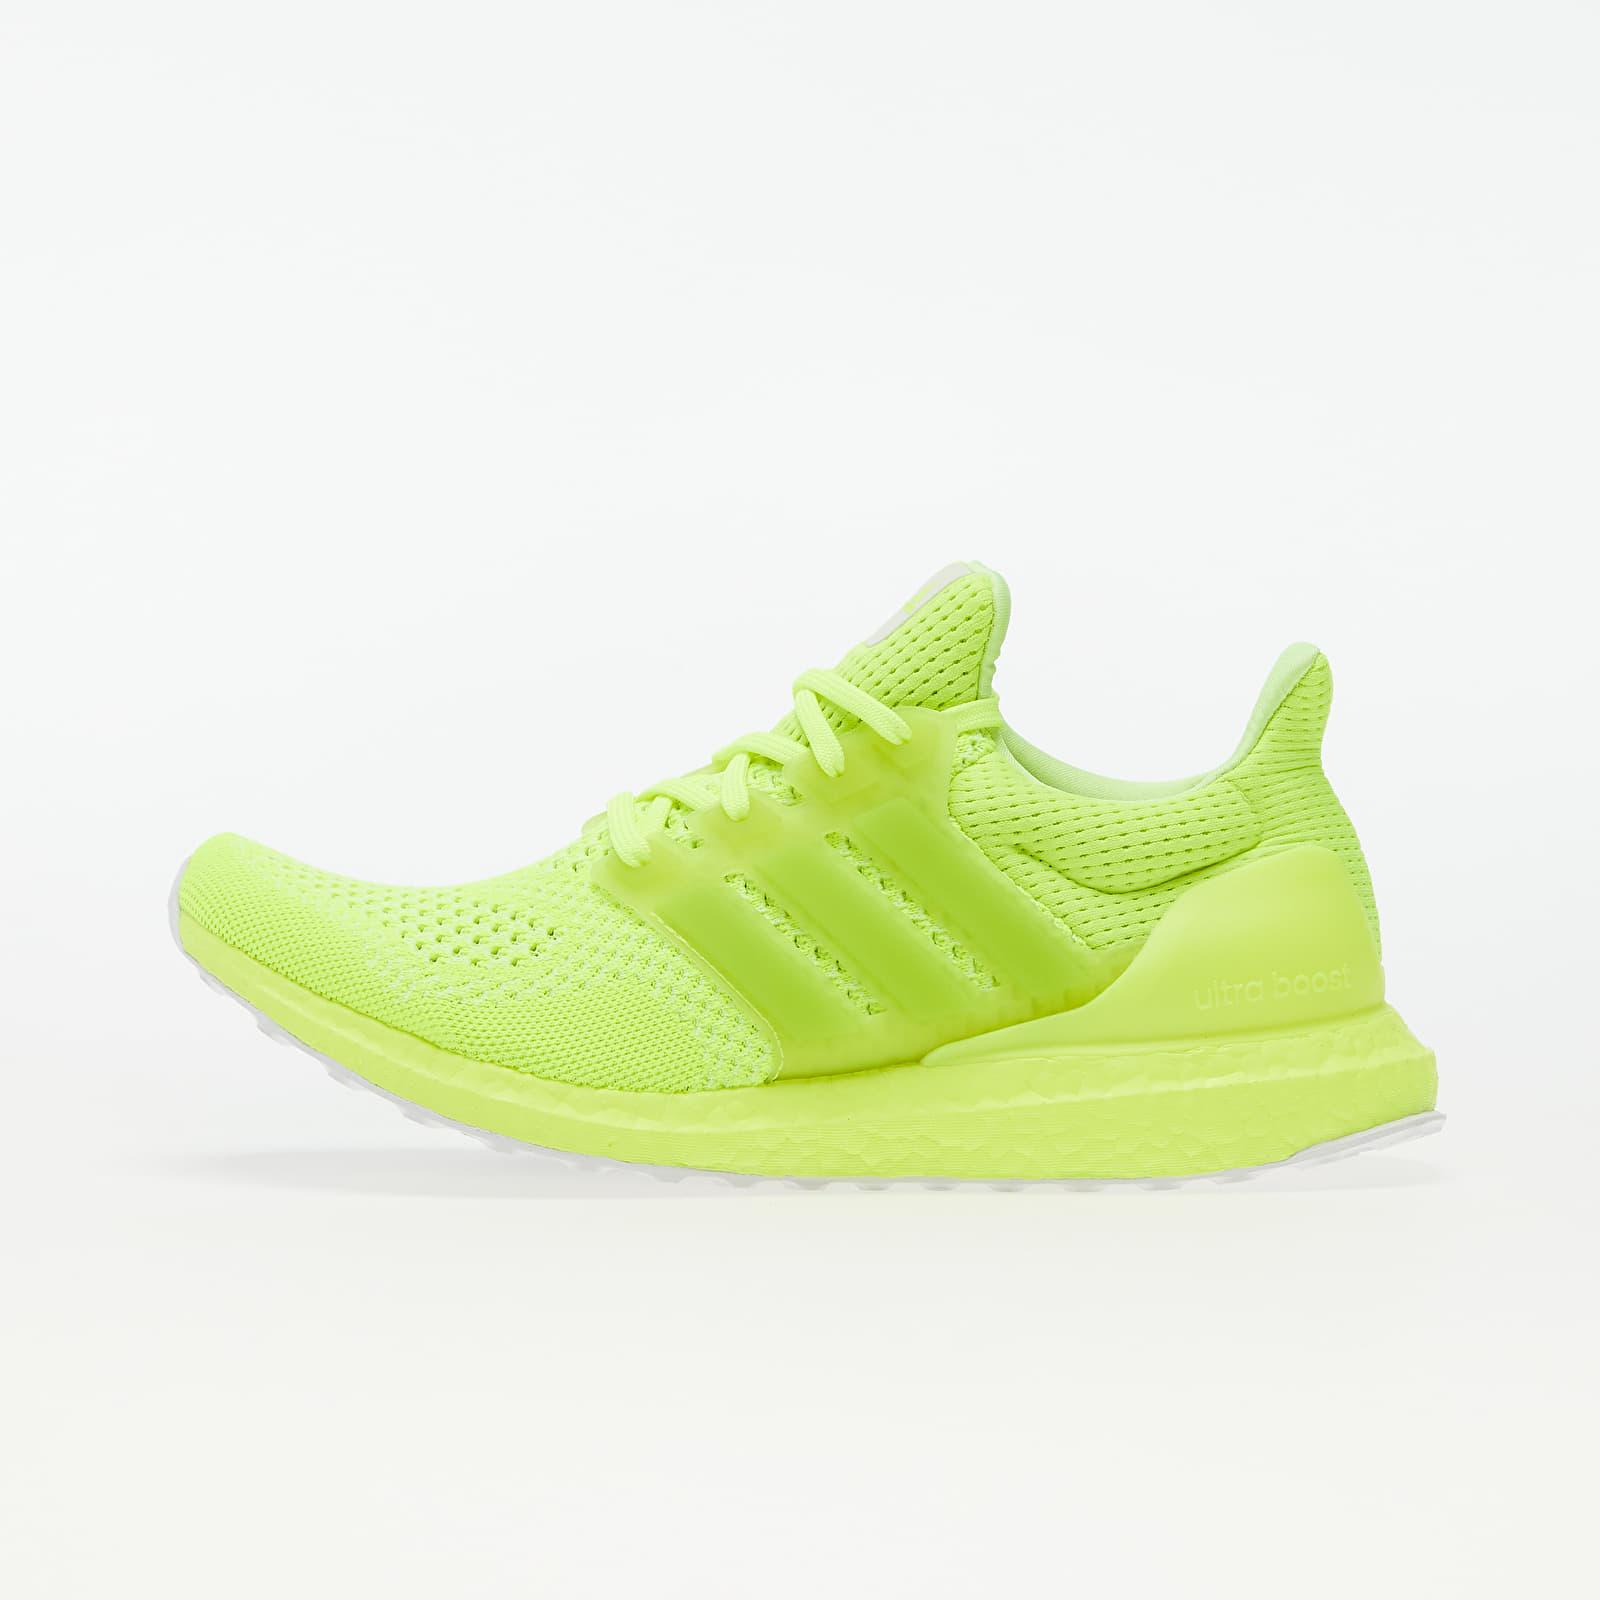 adidas UltraBOOST 1.0 DNA Solar Yellow/ Solar Yellow/ Hi-Res Yellow FX7977